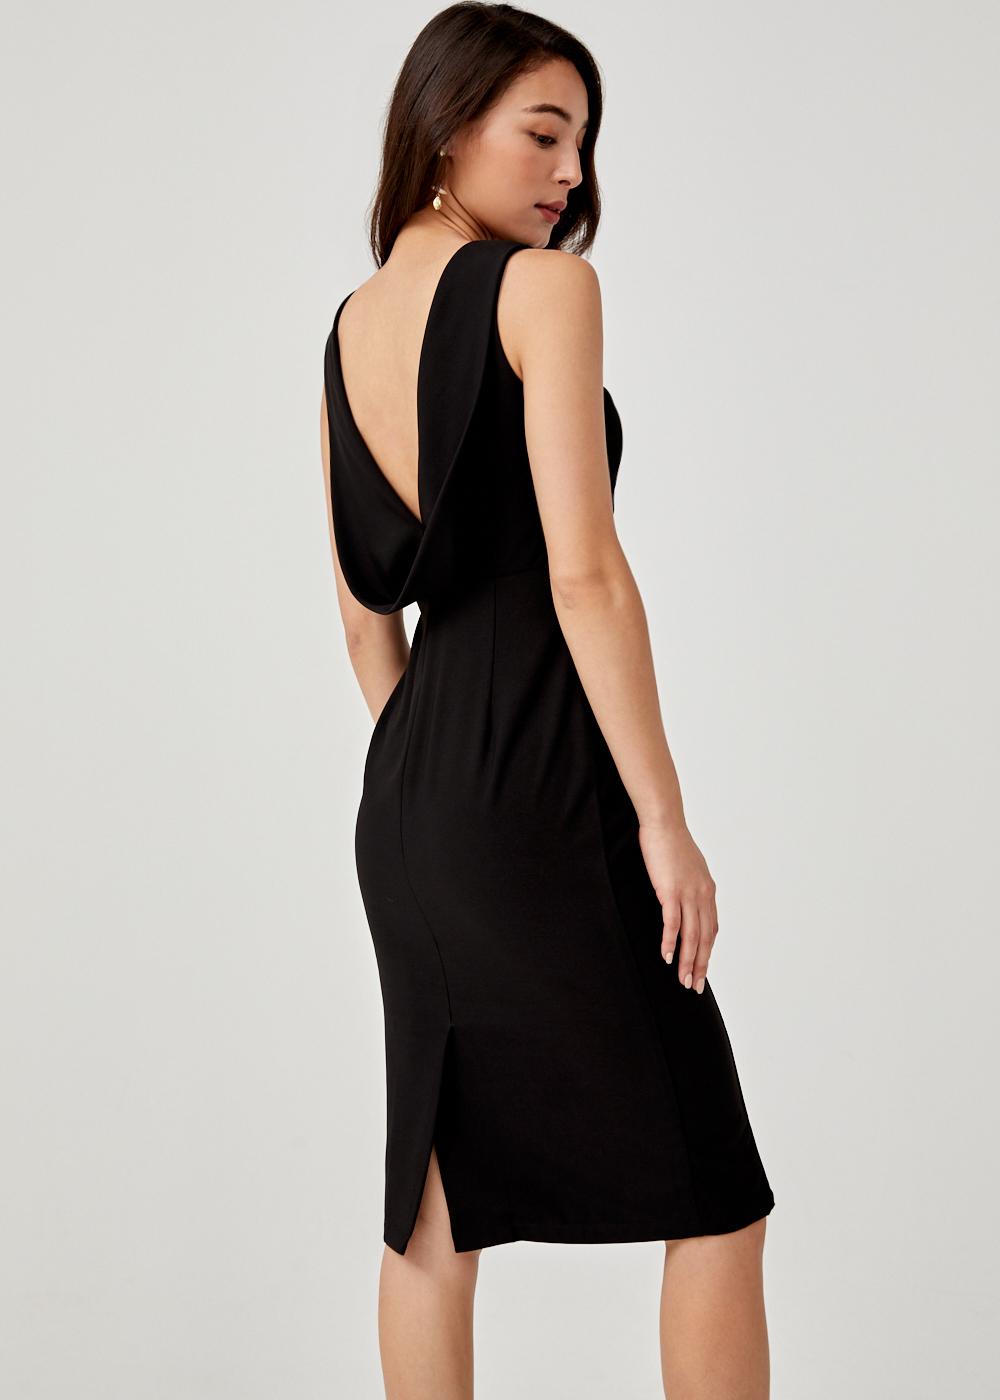 Buy Jair Drape Back Bodycon Dress Love Bonito Singapore Shop Women S Fashion Online